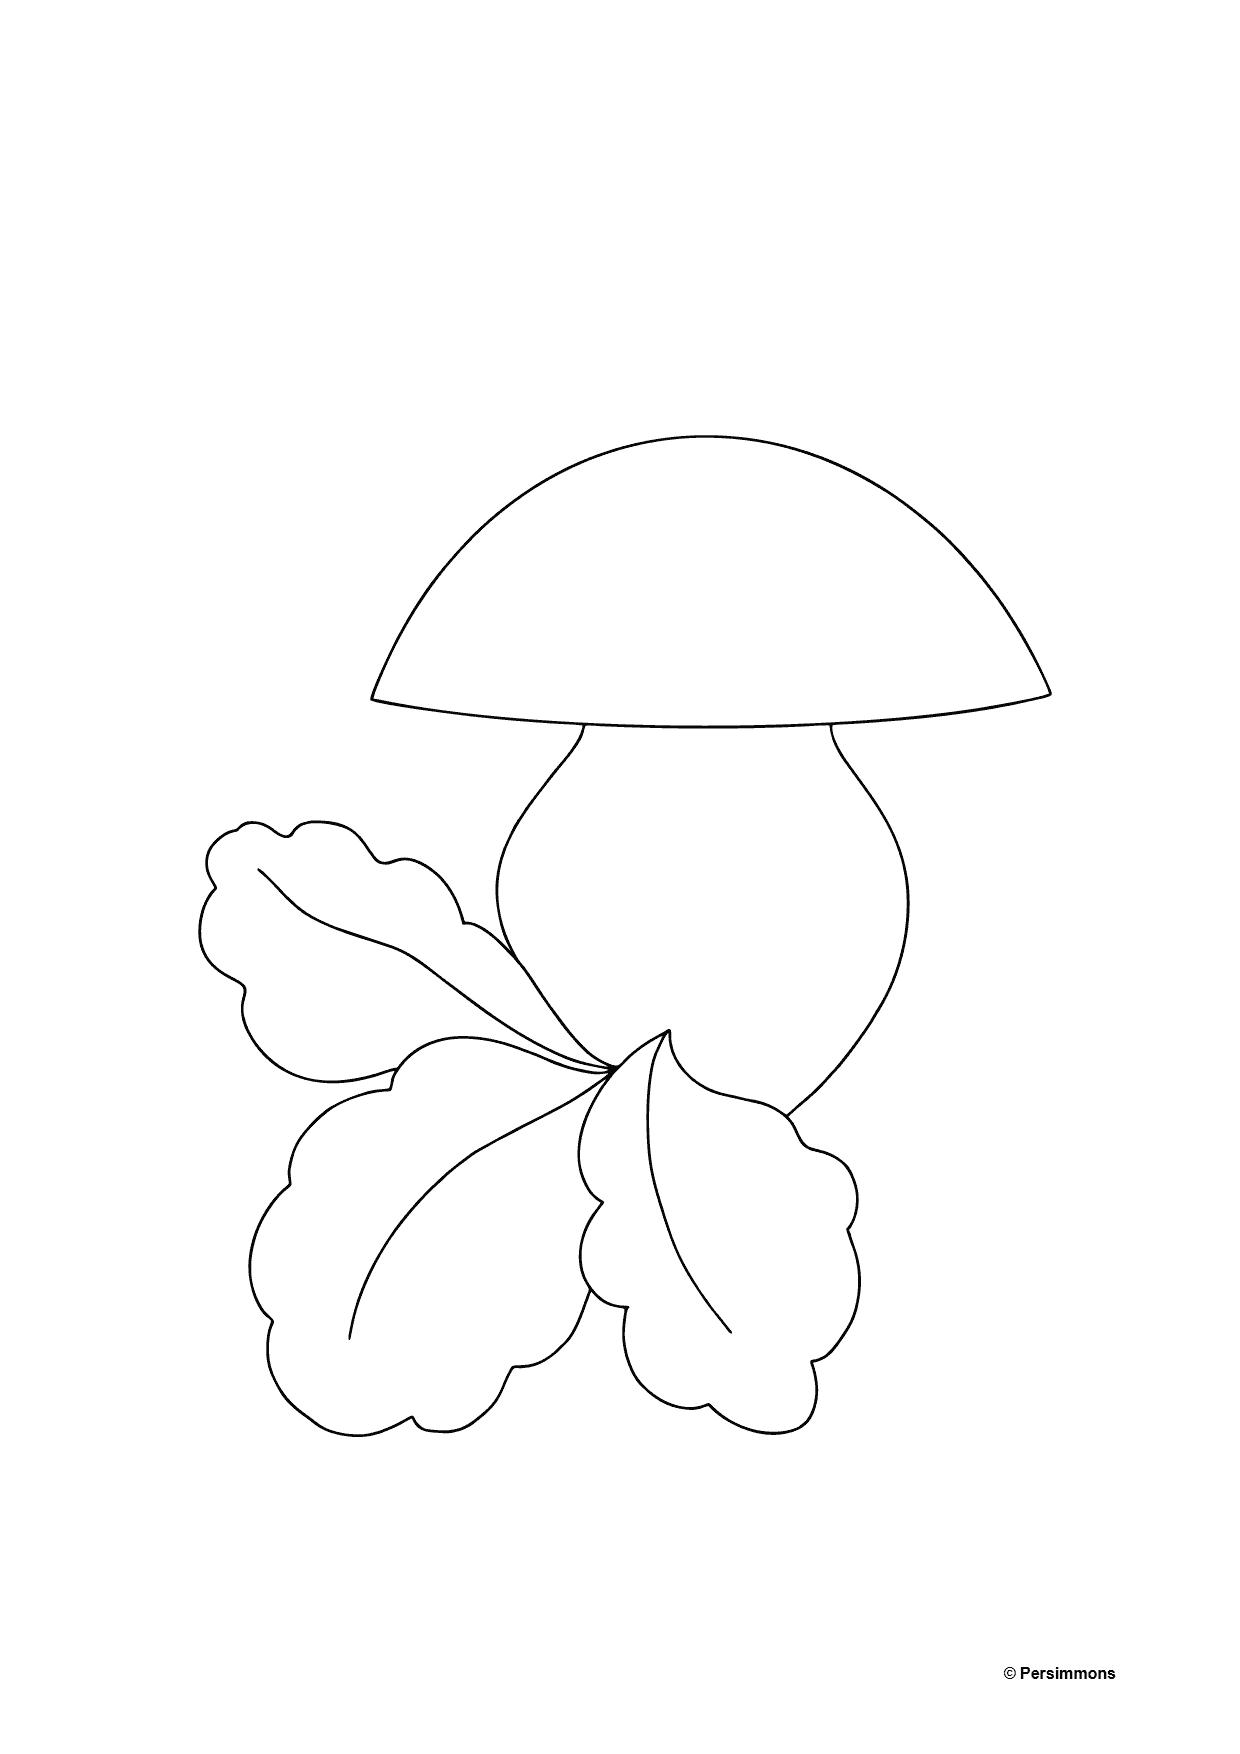 Autumn Coloring Page - Mushroom Season for Kids